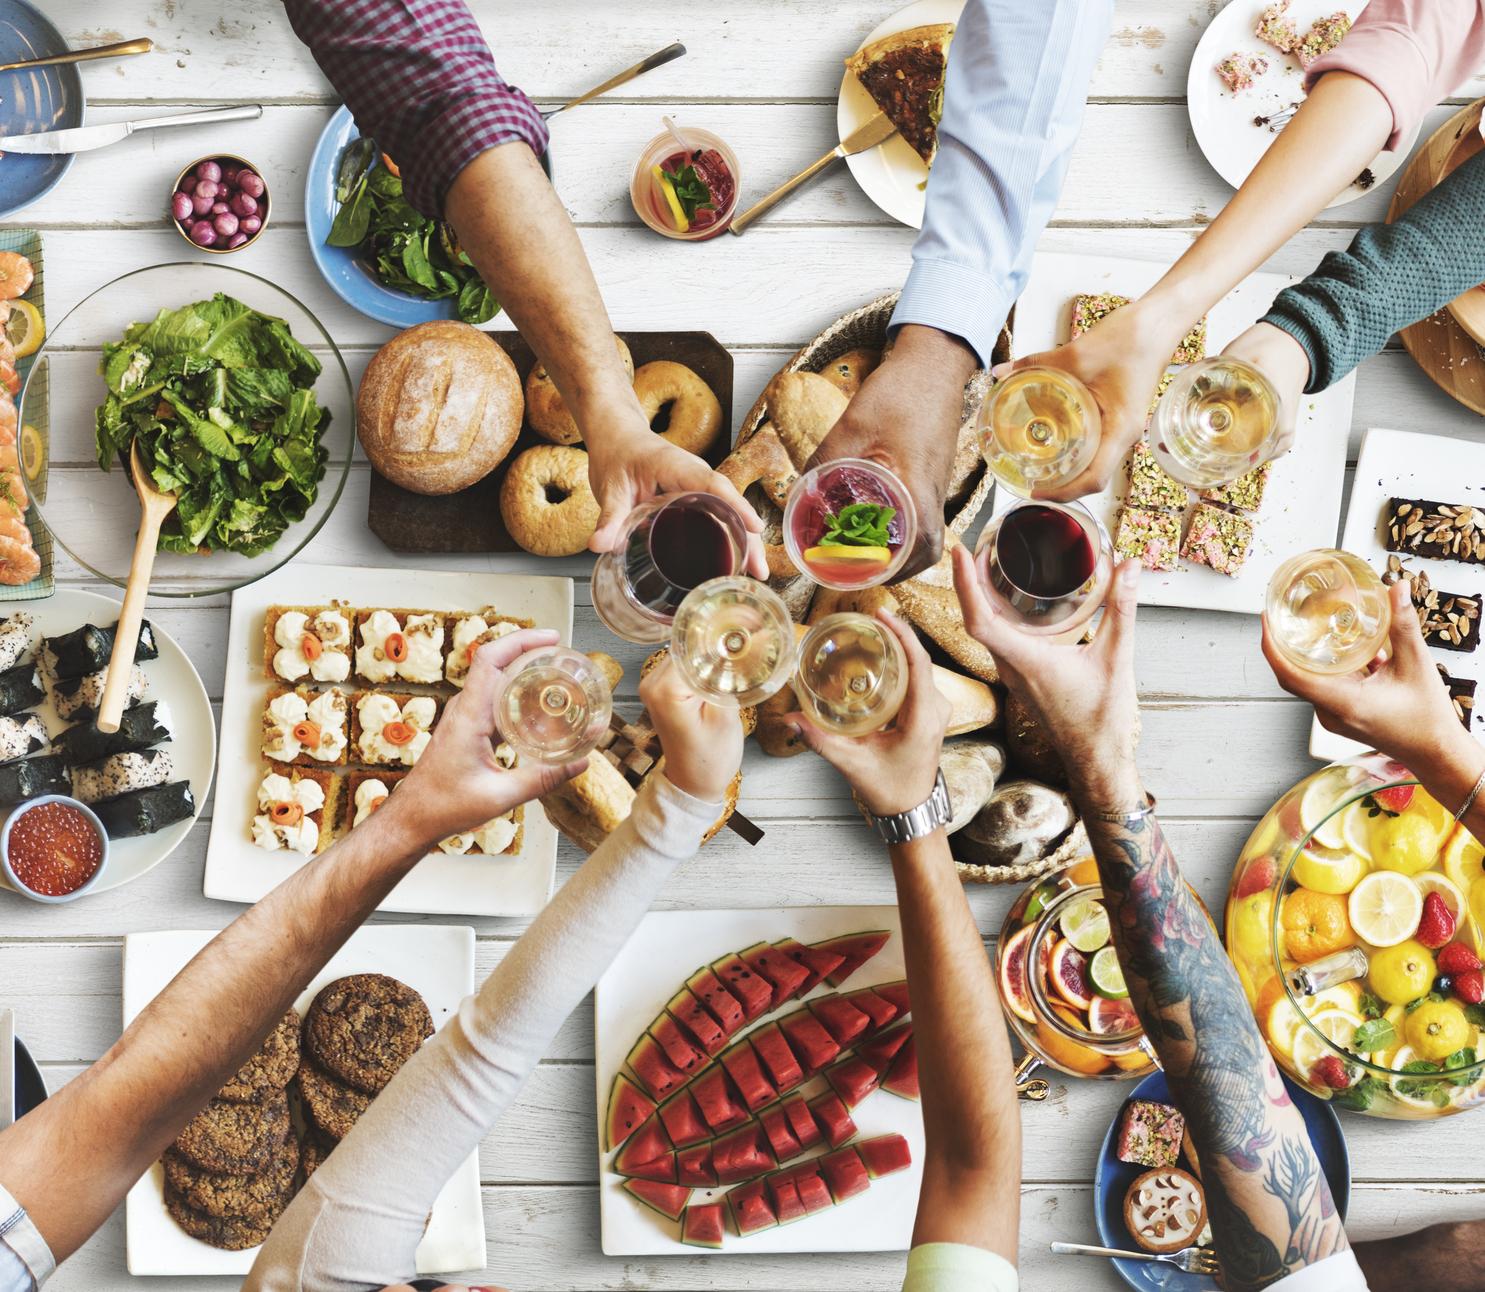 friends-happiness-enjoying-dinning-eating-concept-000092030363-medium.jpg